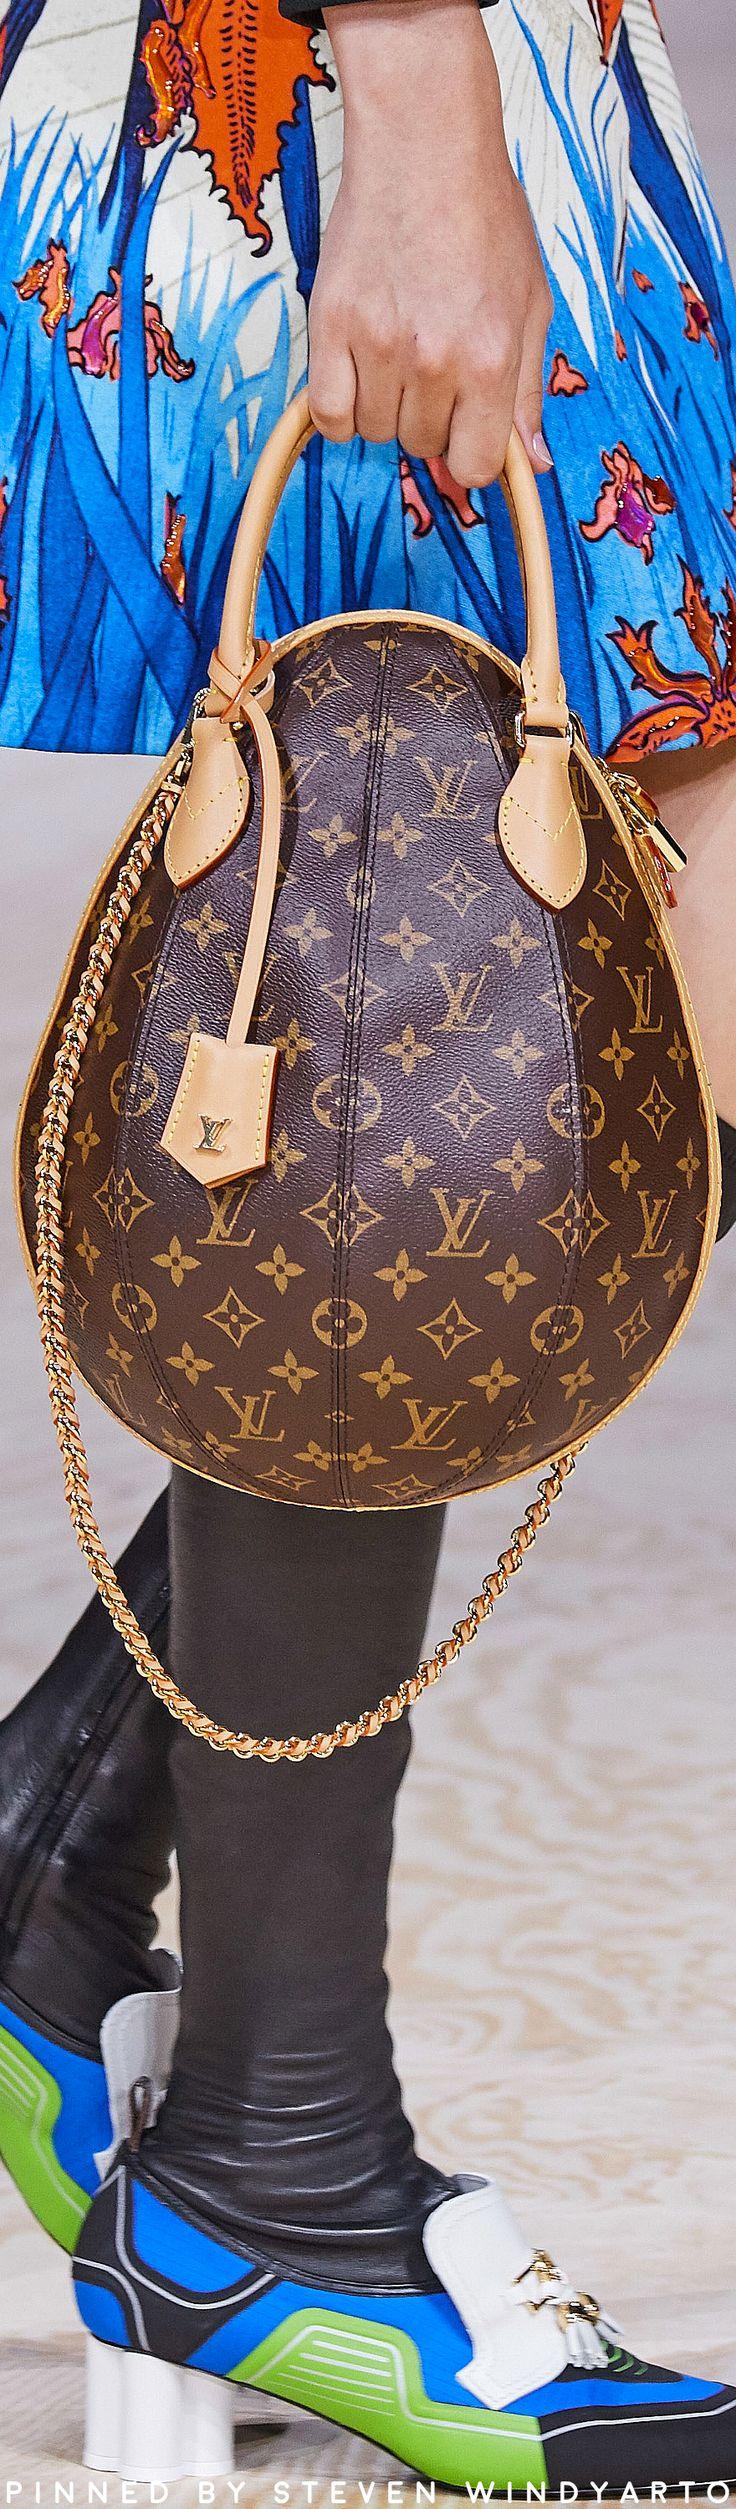 Louis Vuitton Spring 2020 Ready-to-Wear Fashion Show ...